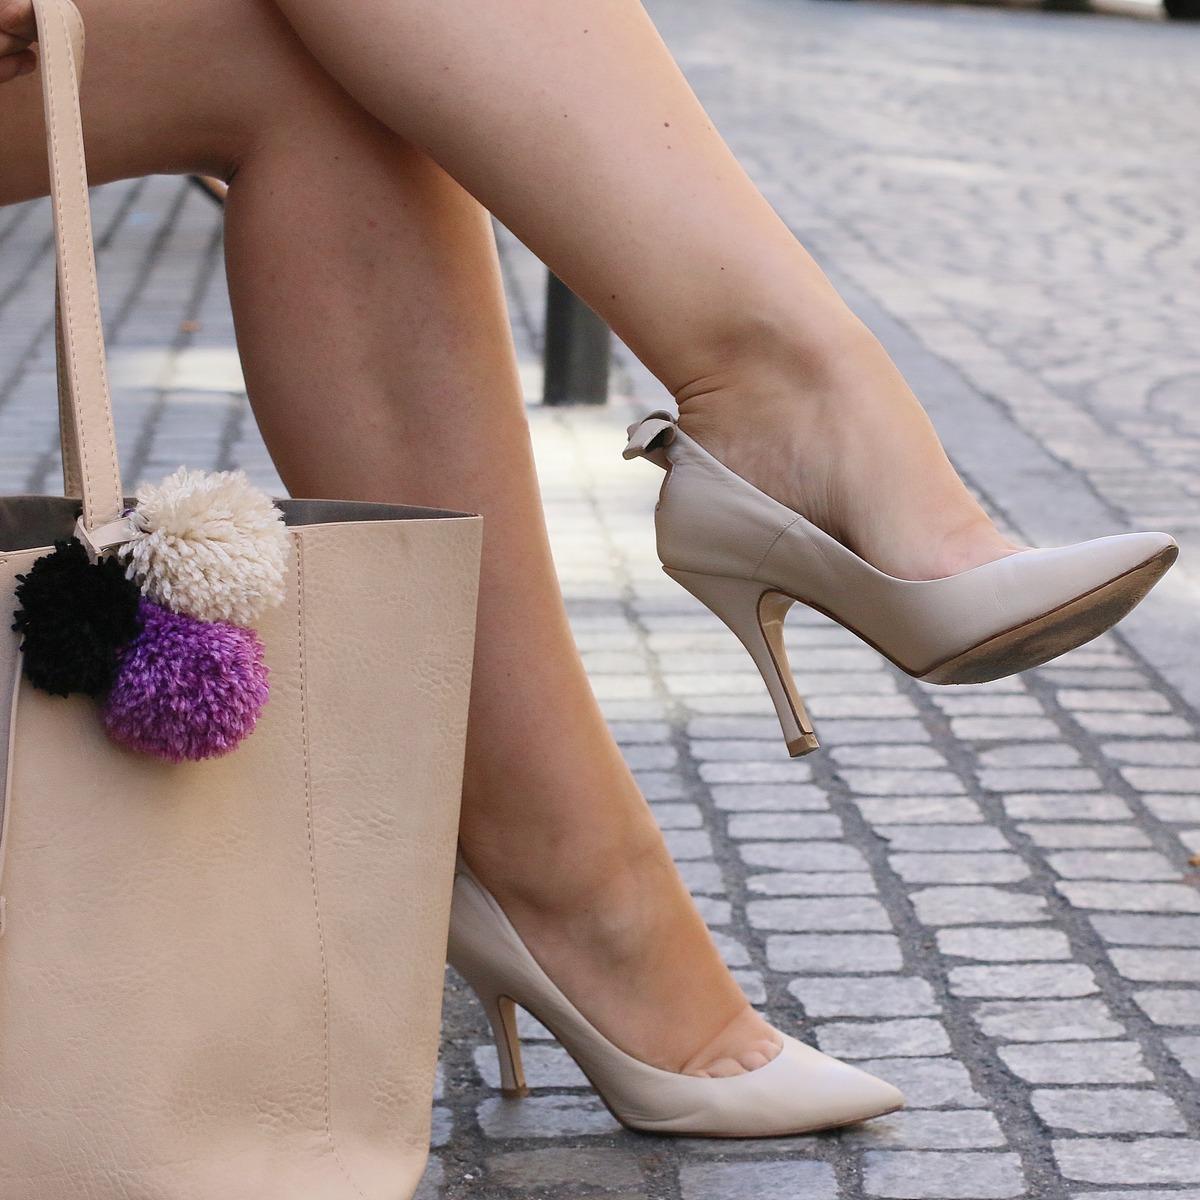 Blog mode femme Paris - Du style, Madame - Streetstyle - sac pompoms